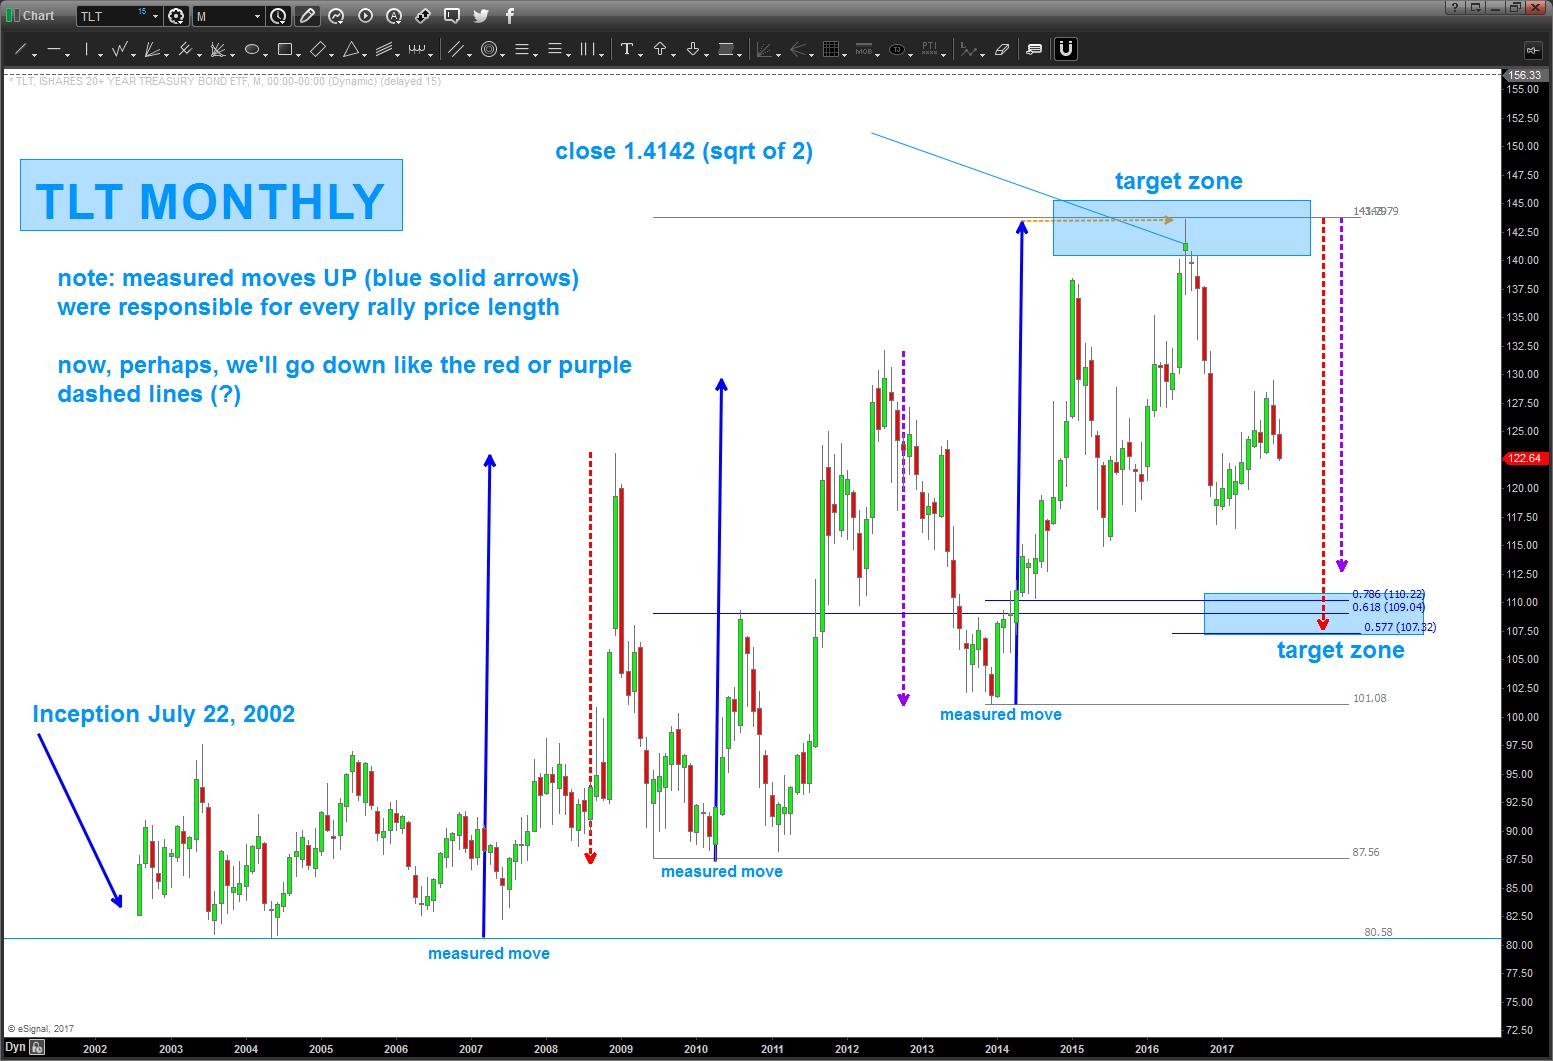 tlt 20 year treasury bond chart lower price targets_october